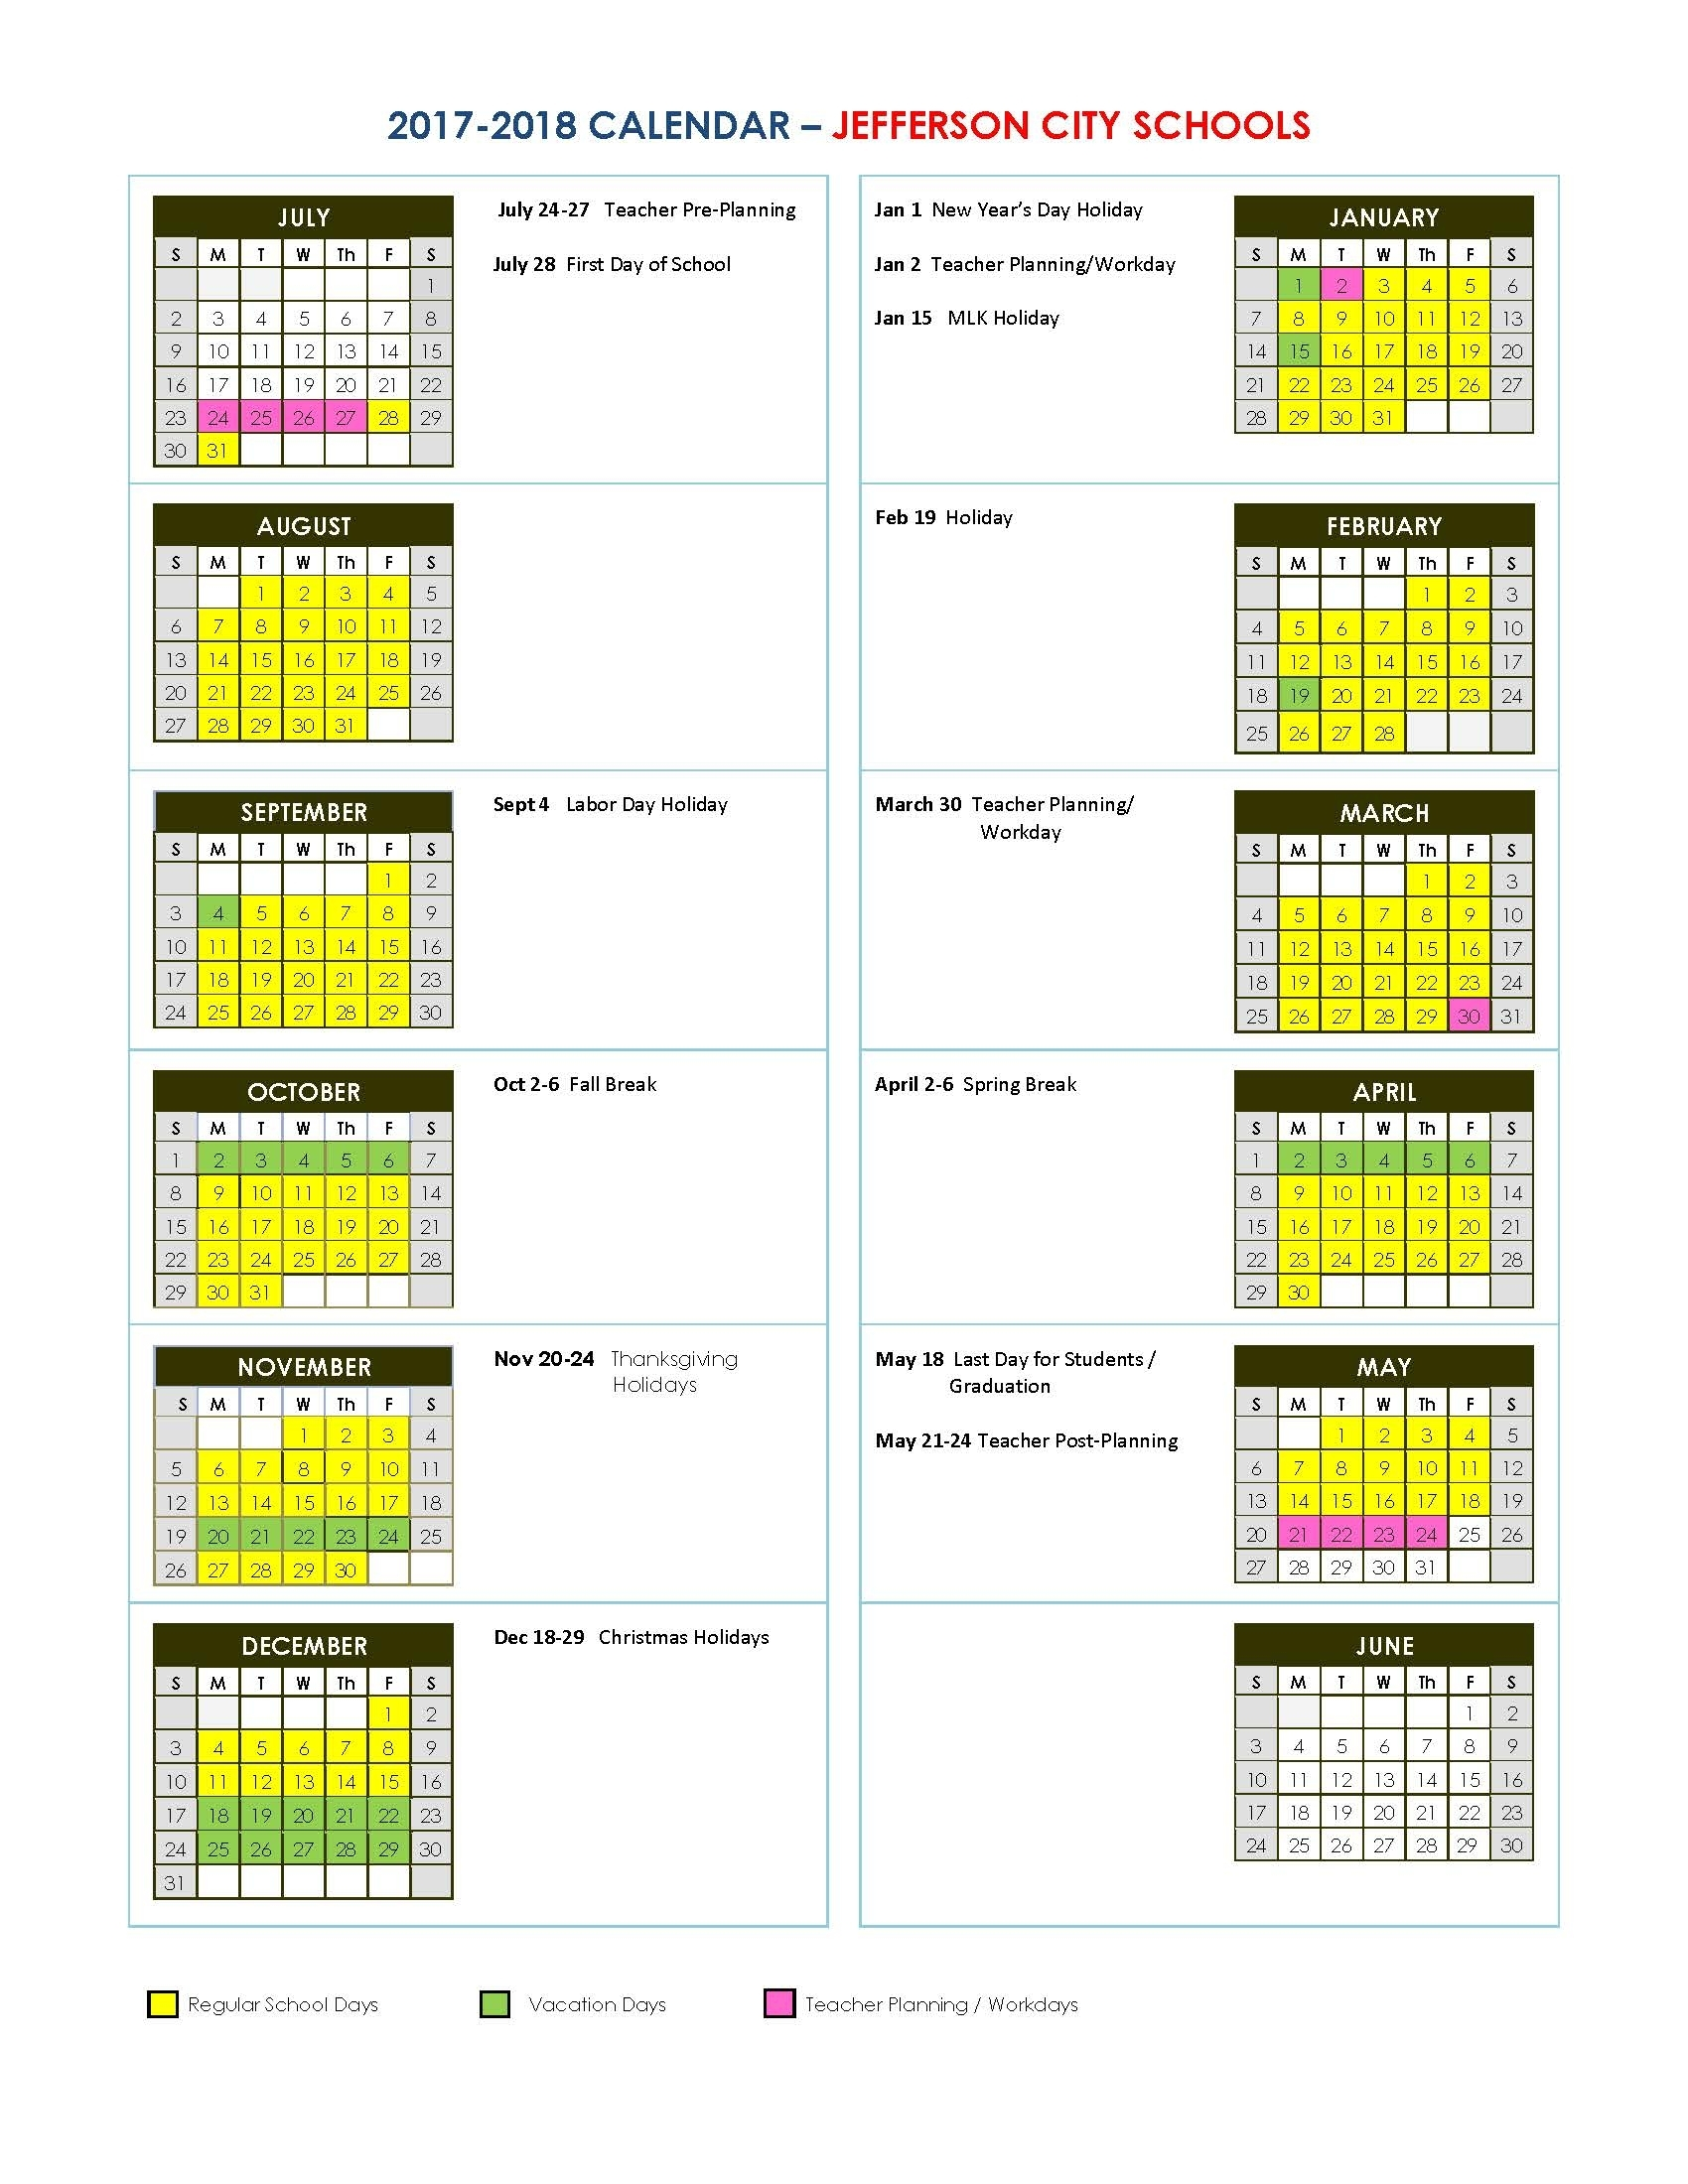 Jefferson City Schools regarding Uga Academic Calendar 2019 2020